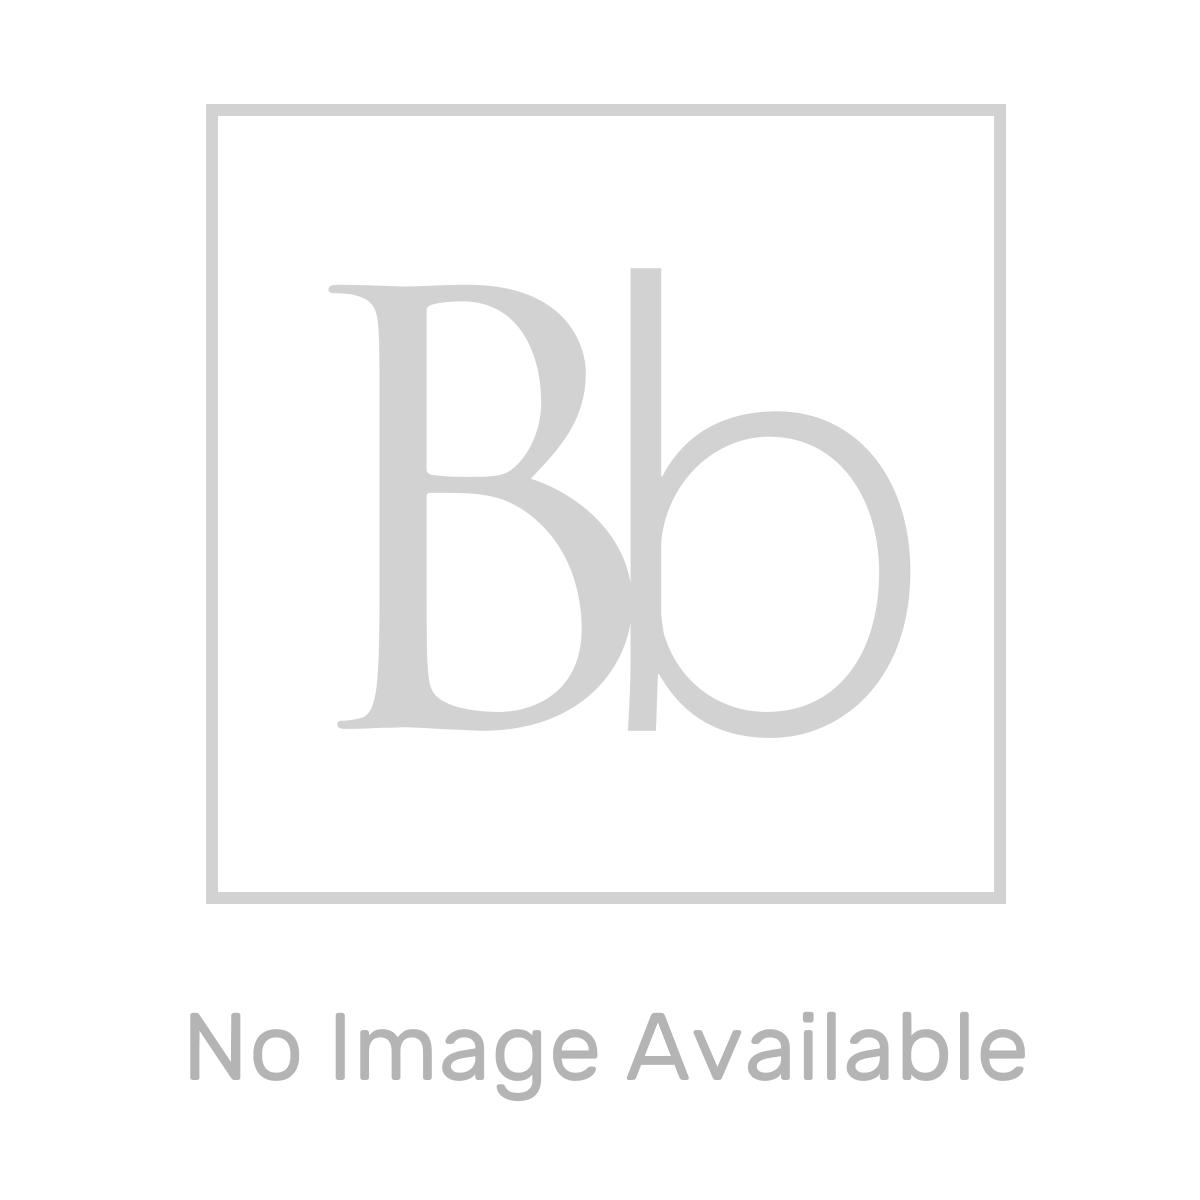 Ikoma White Gloss Vanity Unit with Basin 750mm Basin